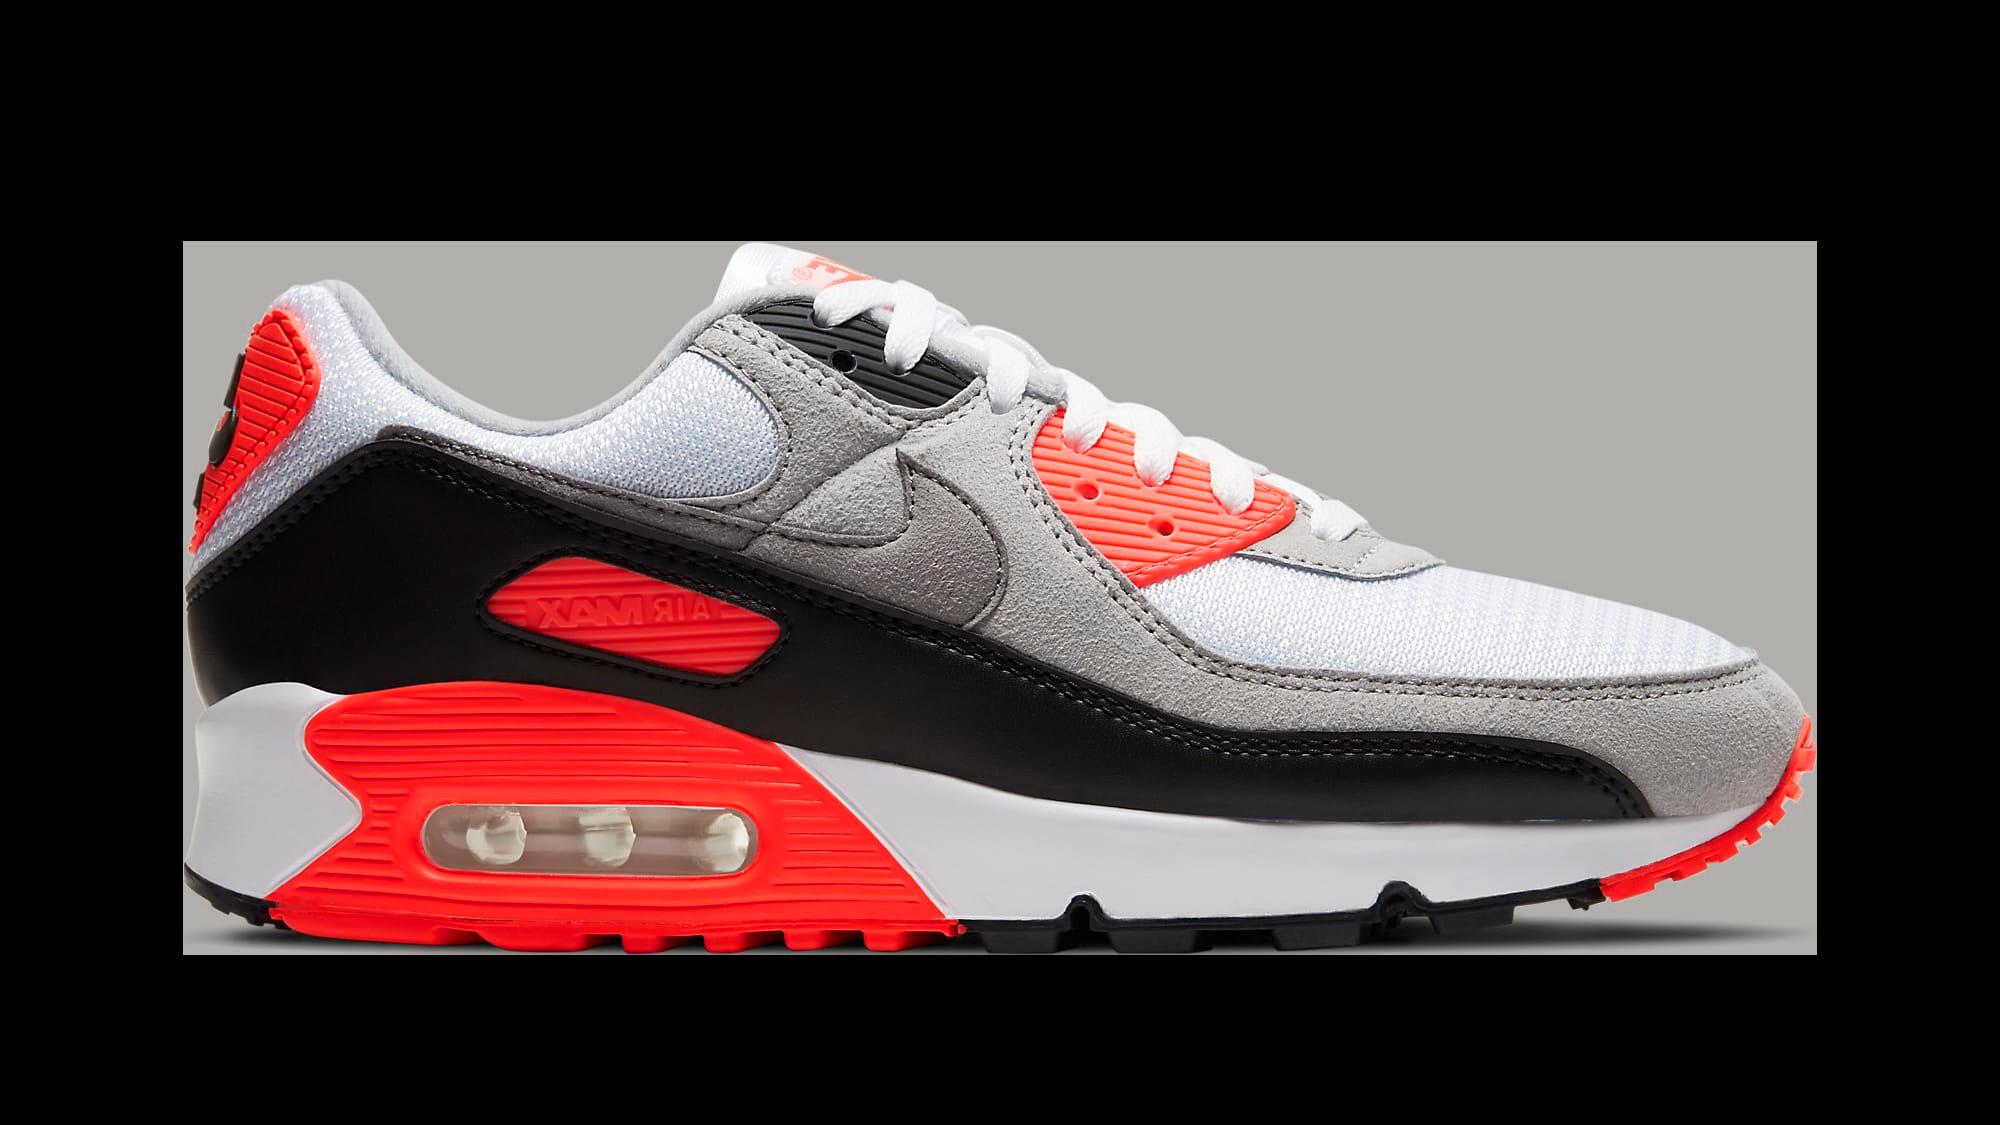 Nike Air Max 90 Infrared (2020